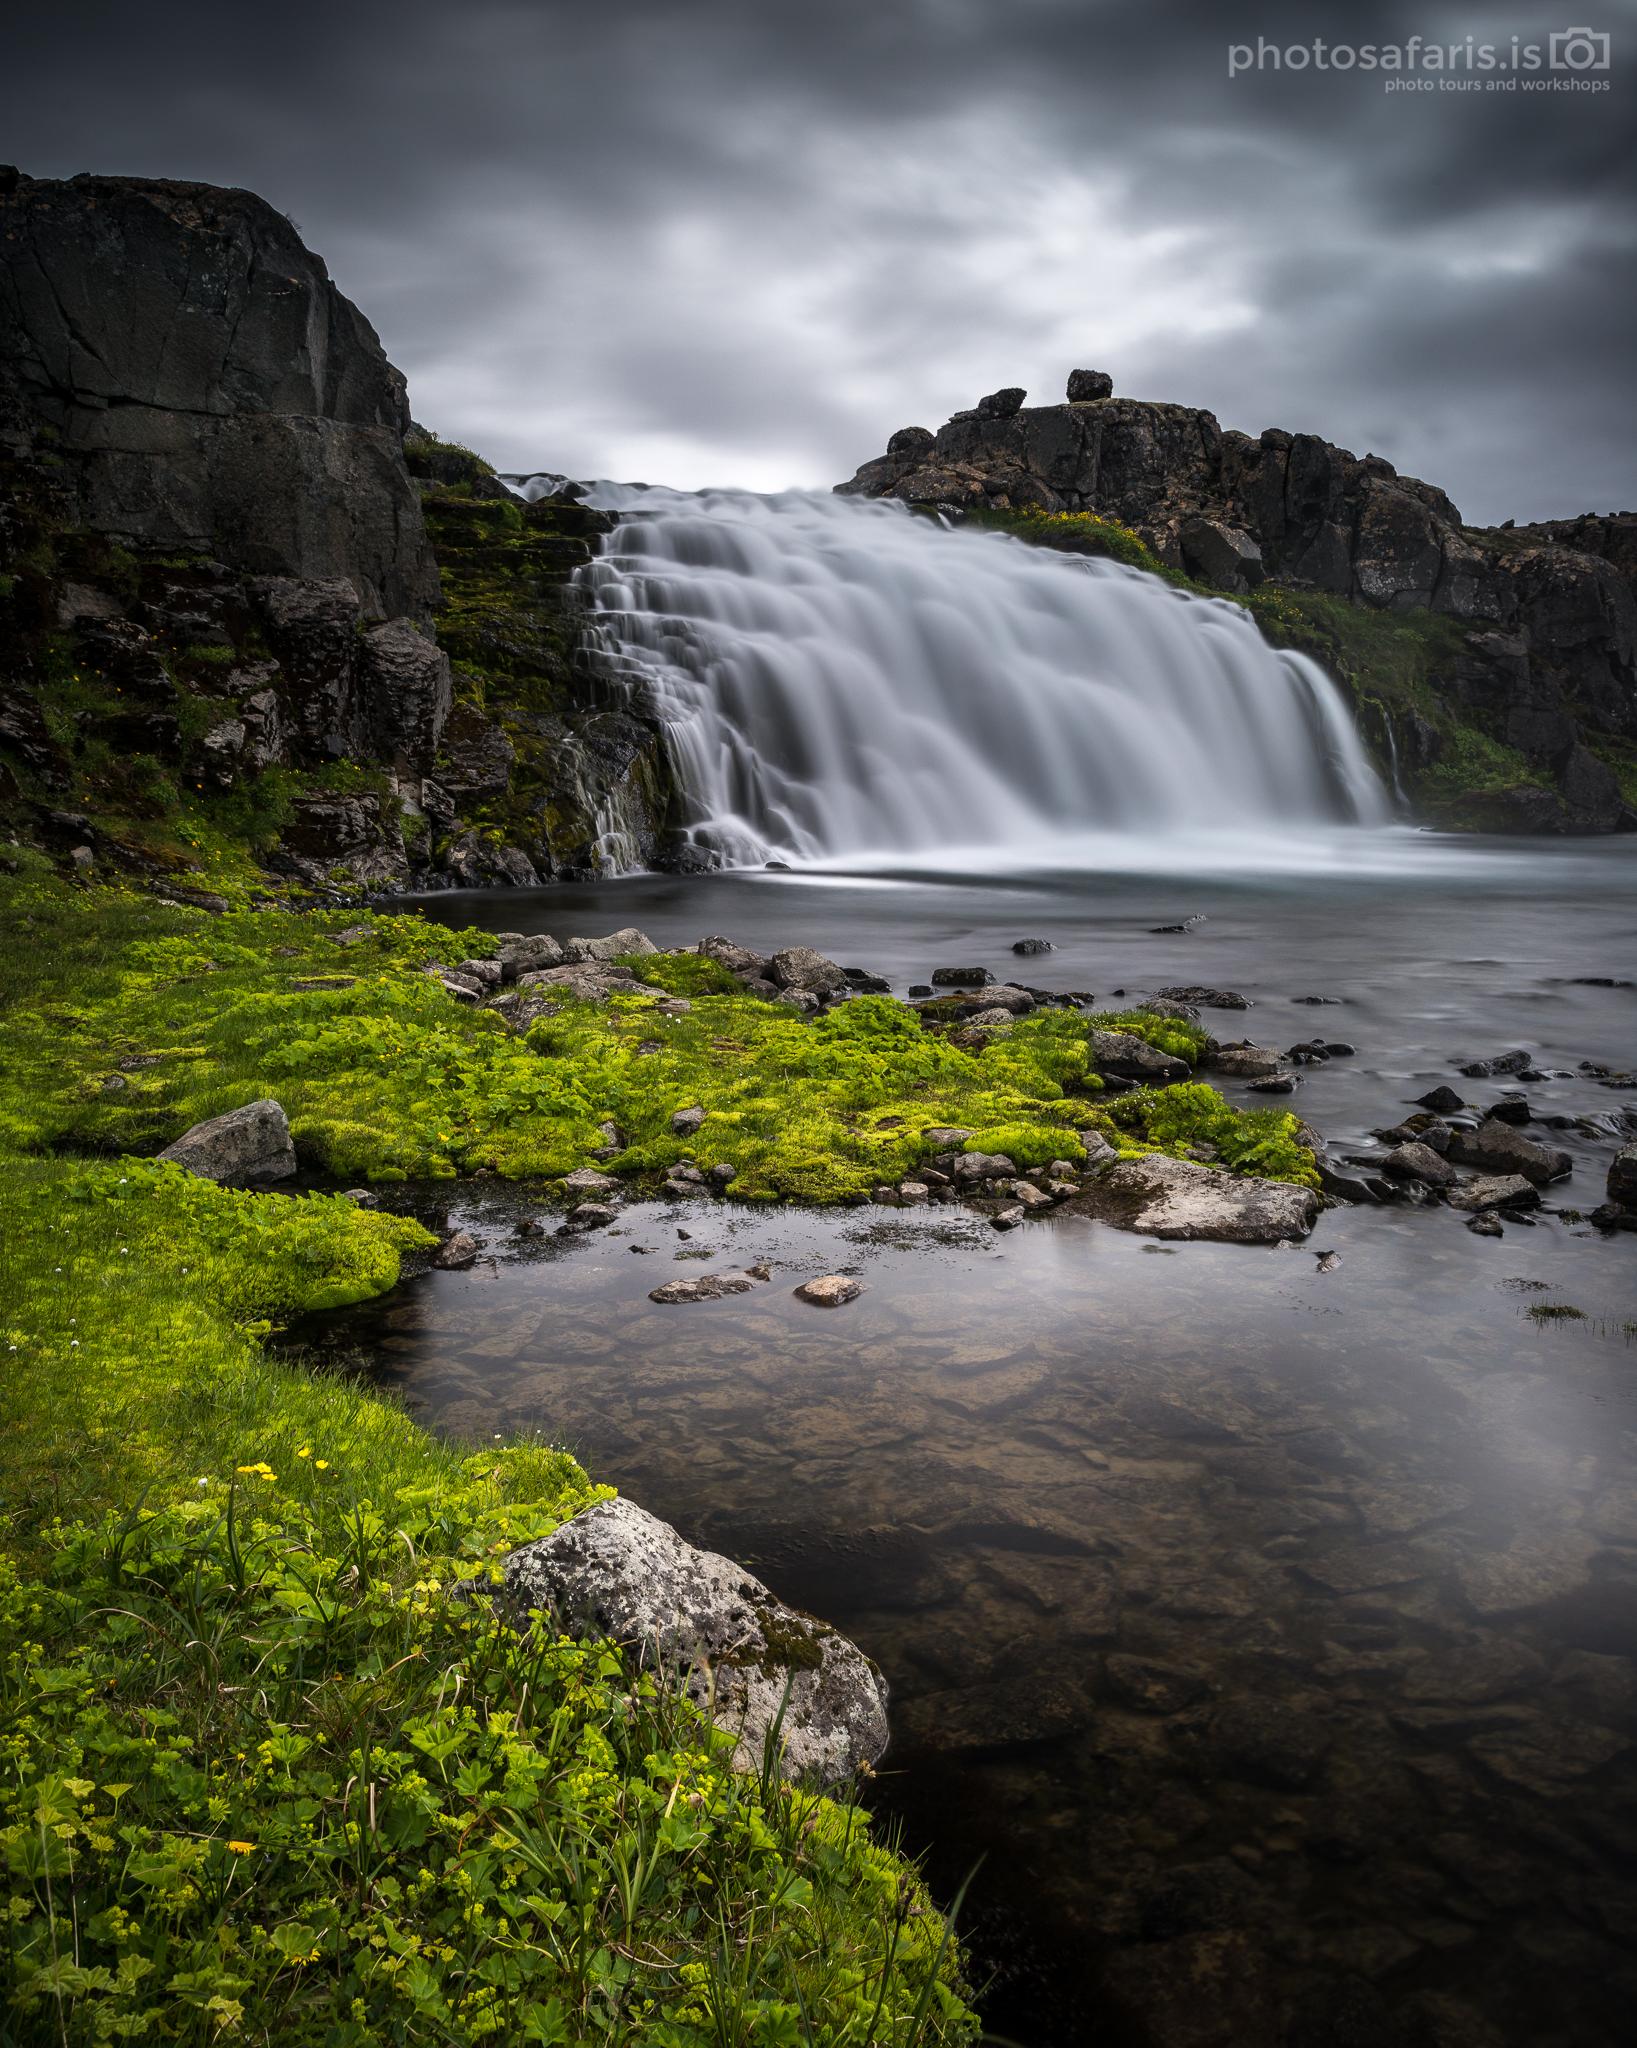 waterfall_dynjandisheidi.jpg